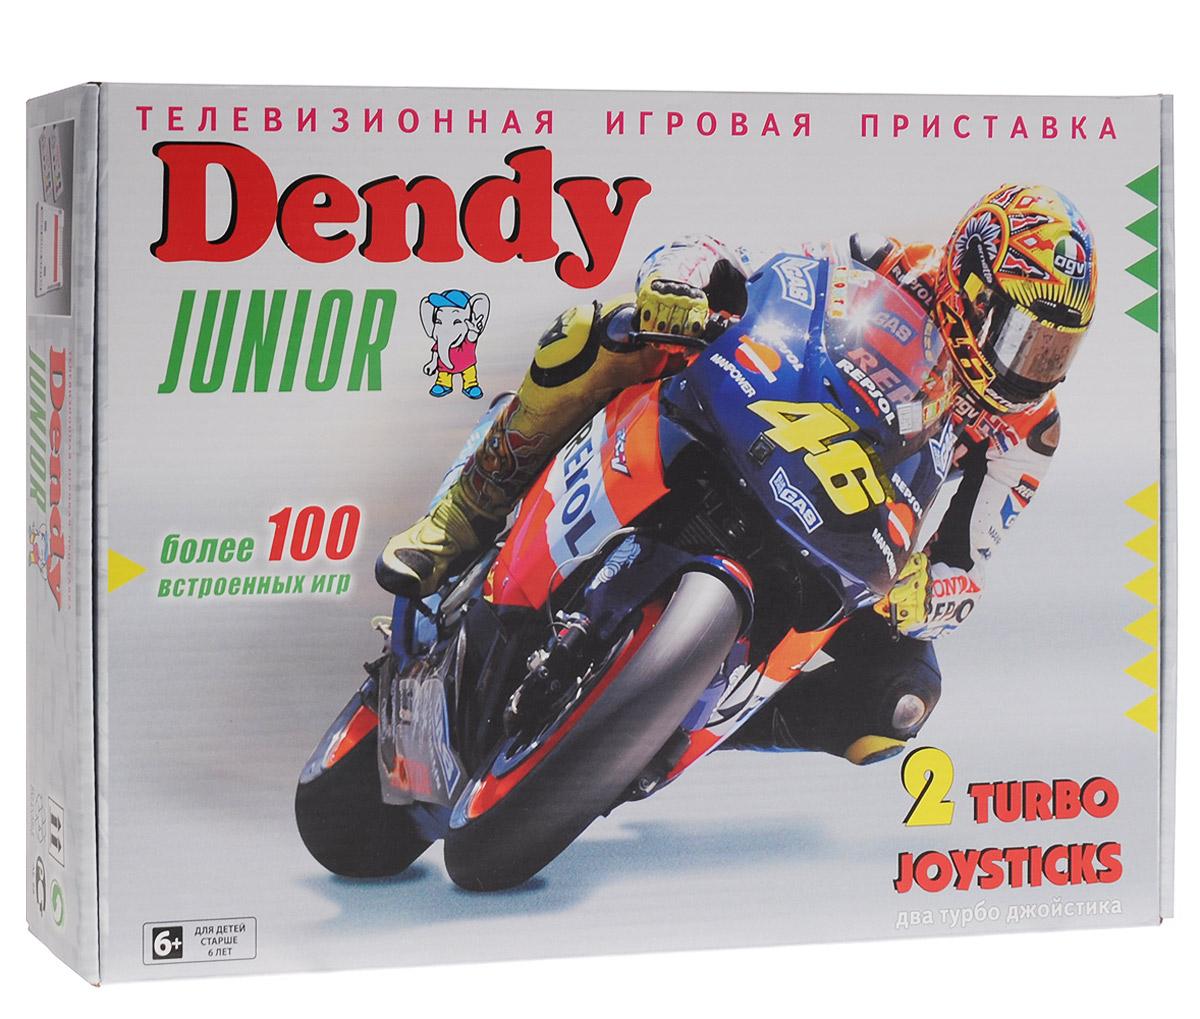 Игровая приставка Dendy Junior (8 bit) pgp aio creative 32 bit mgs11 b портативная игровая приставка blue orange